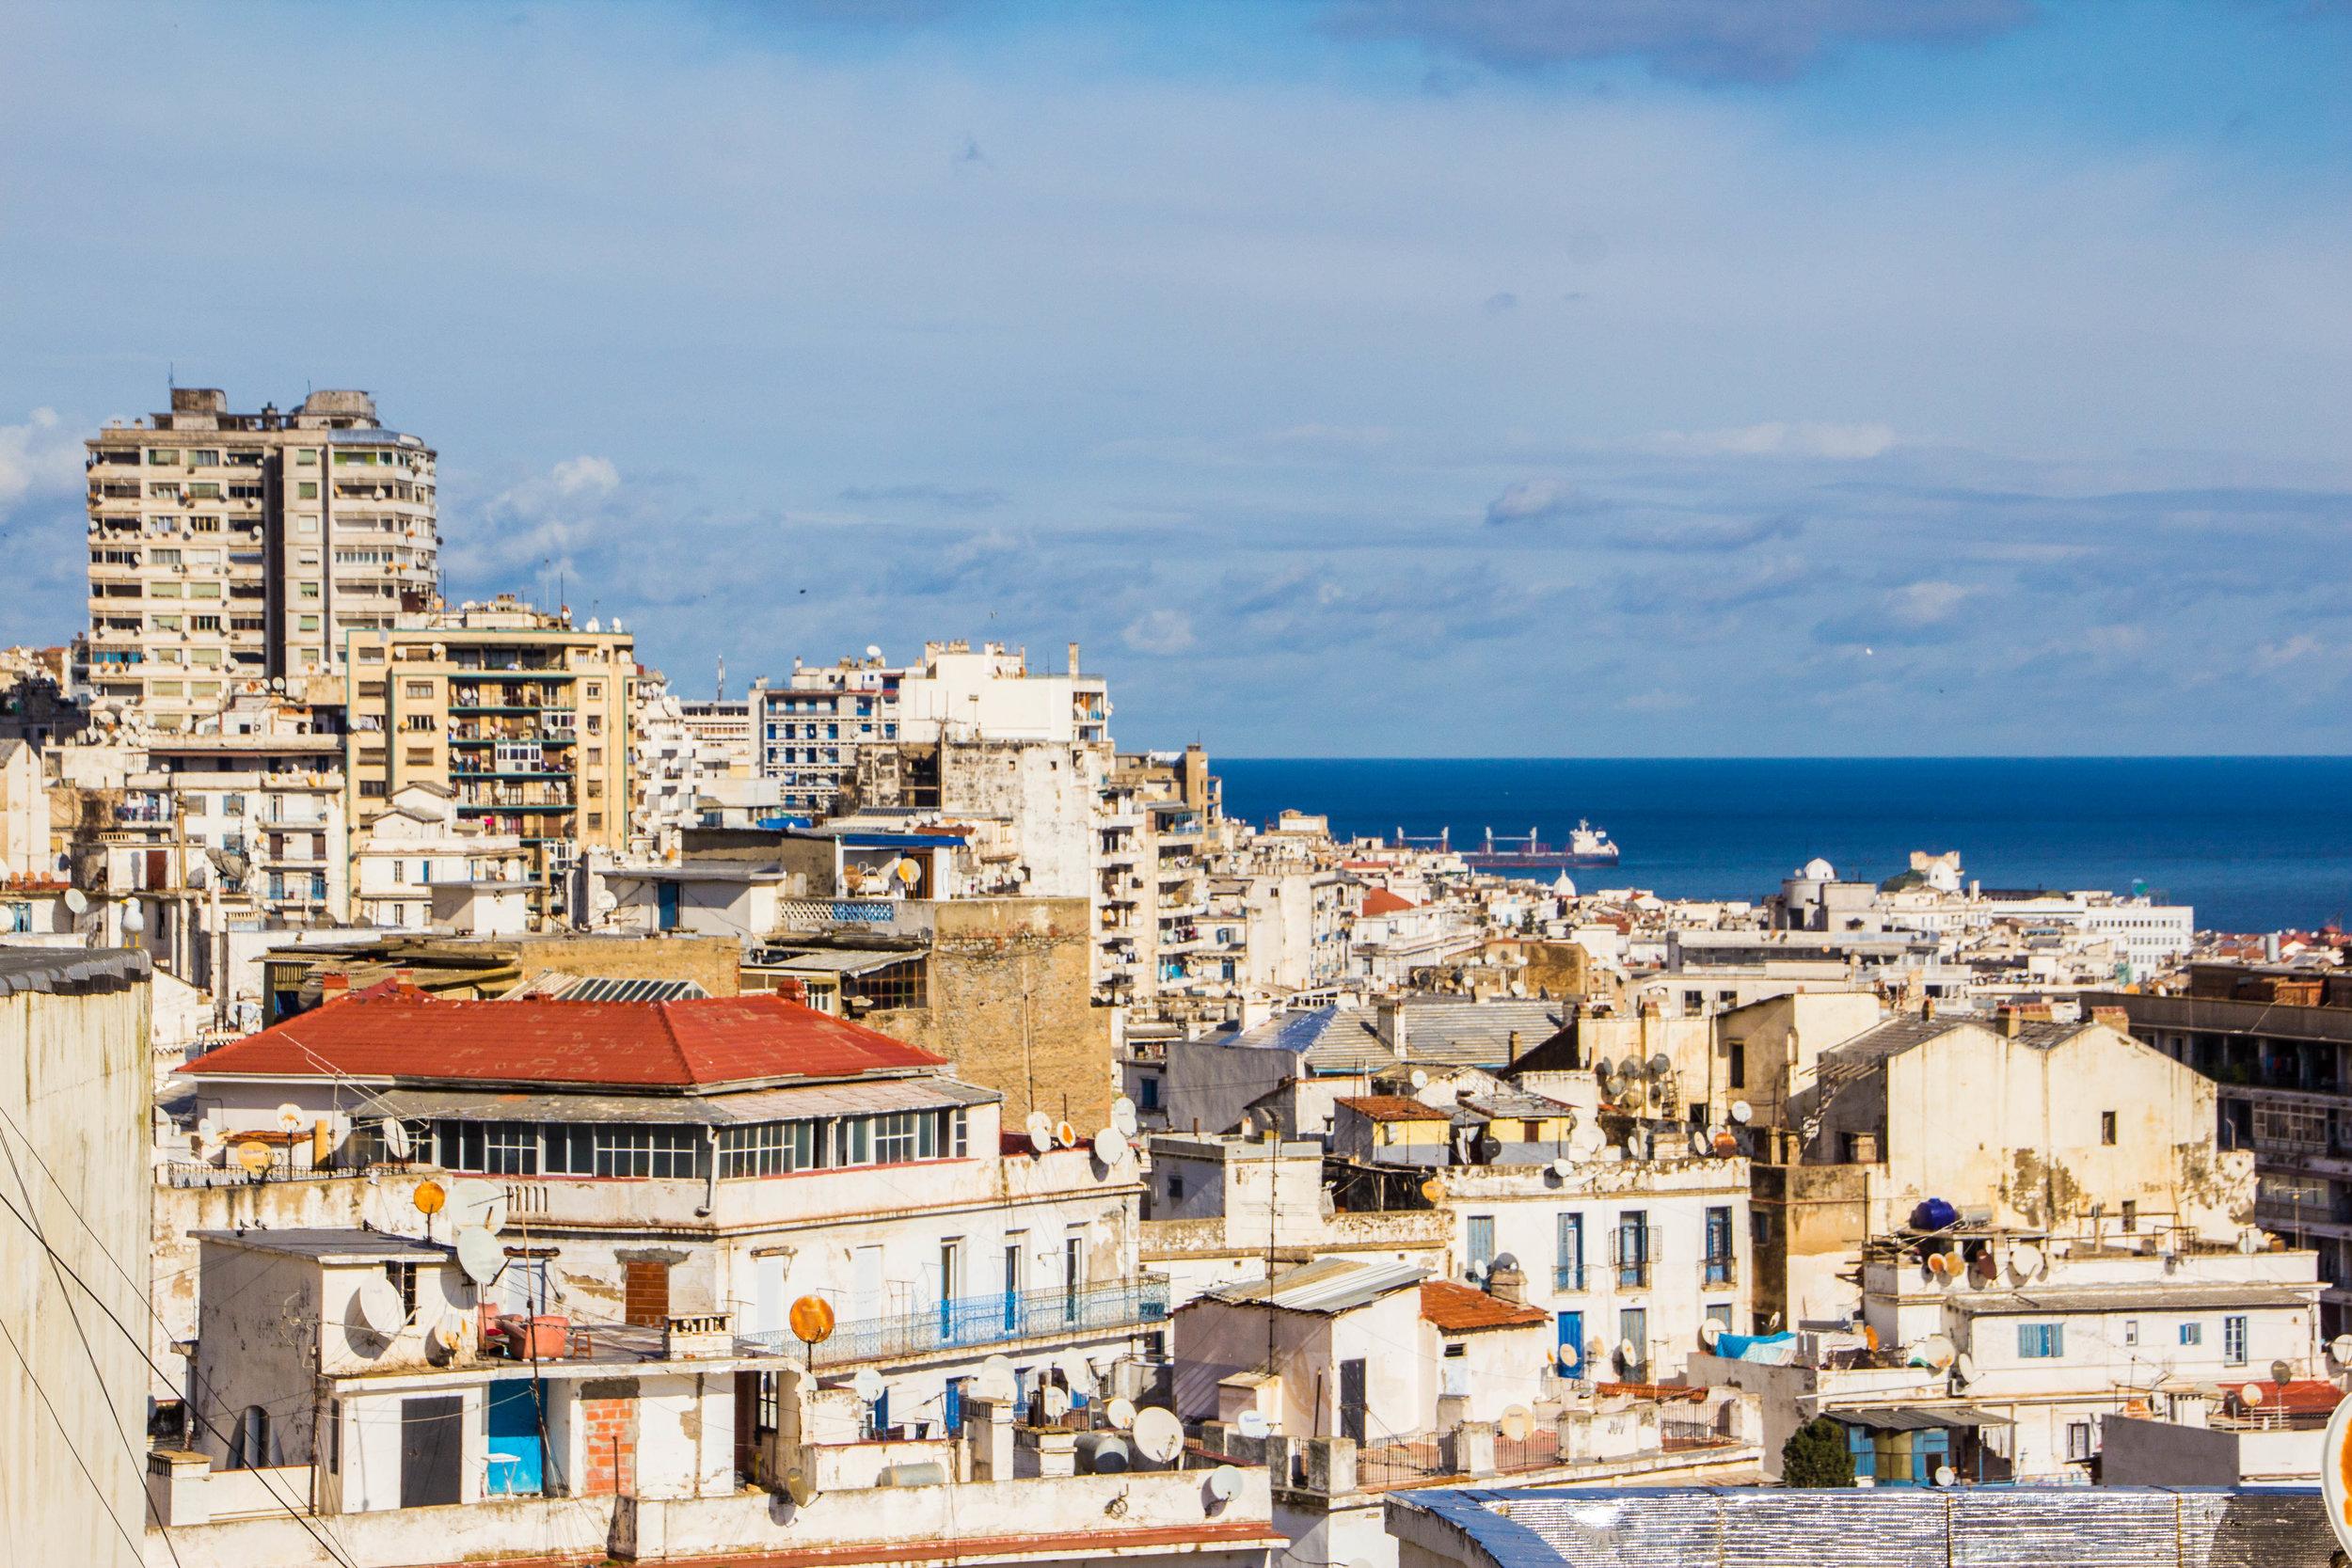 algiers-algieria-streets-8.jpg